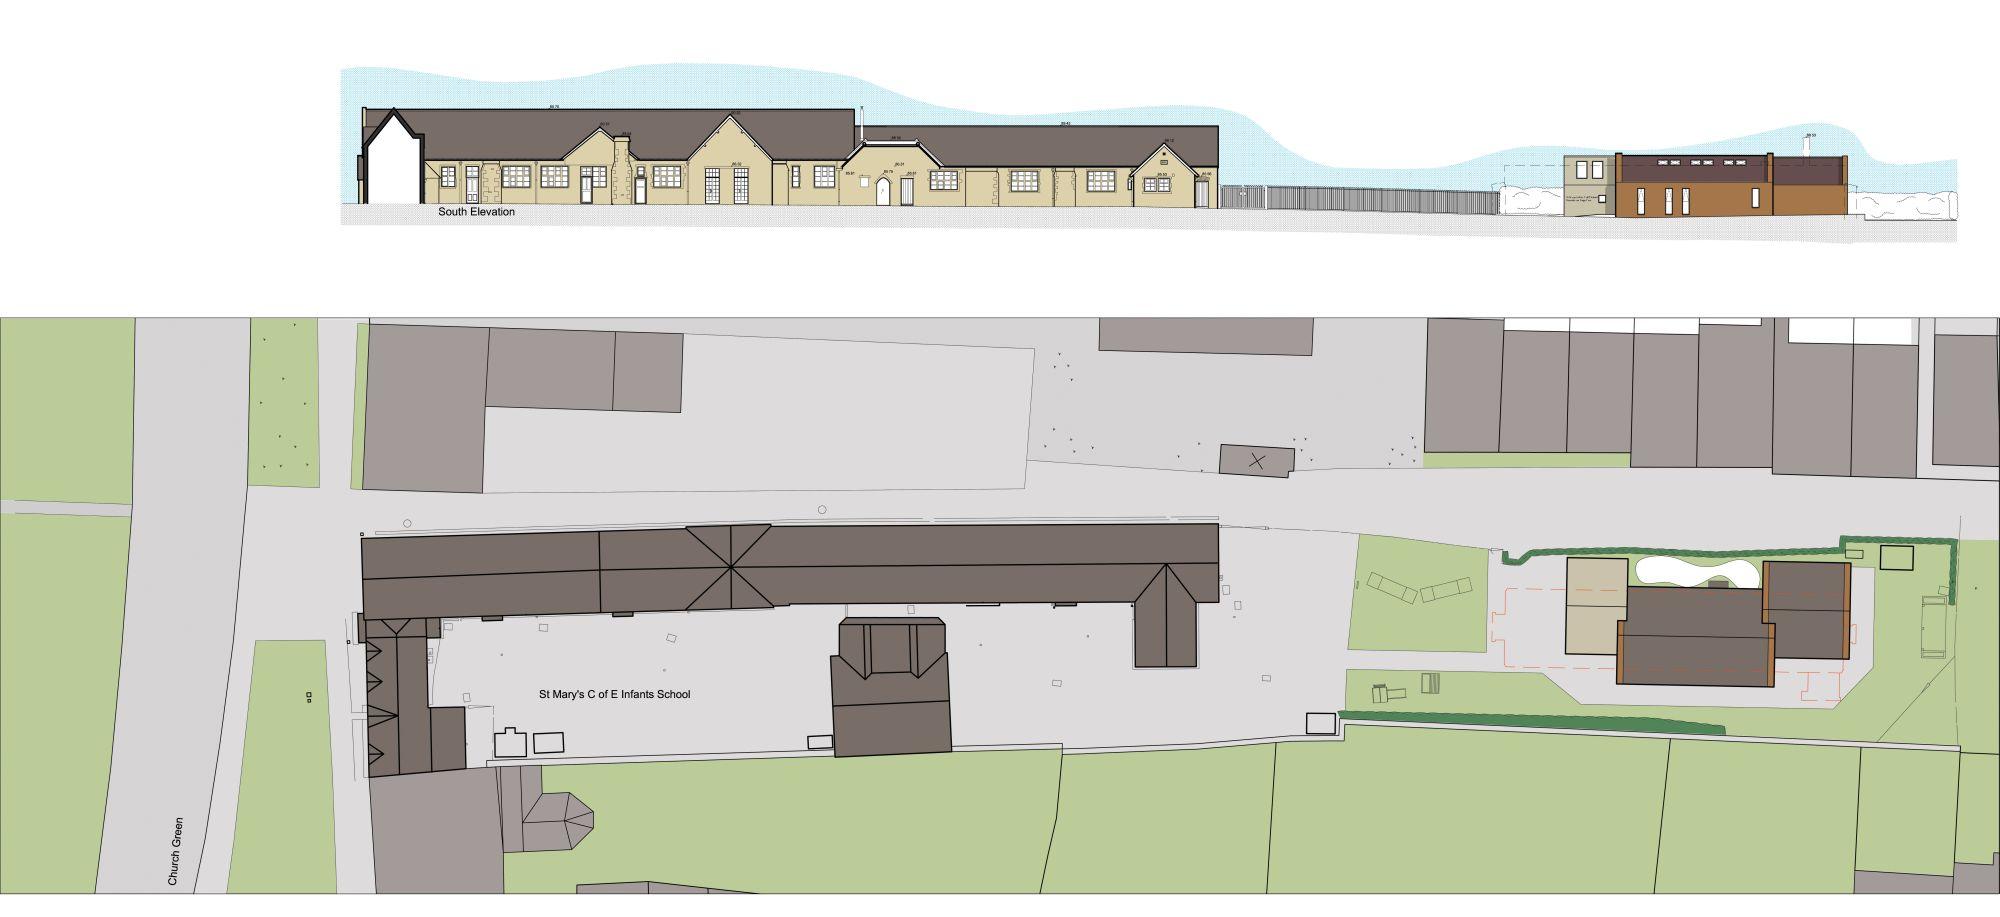 Interior design site plan picture and sketch of friendly school design contemporary cidren zone layout